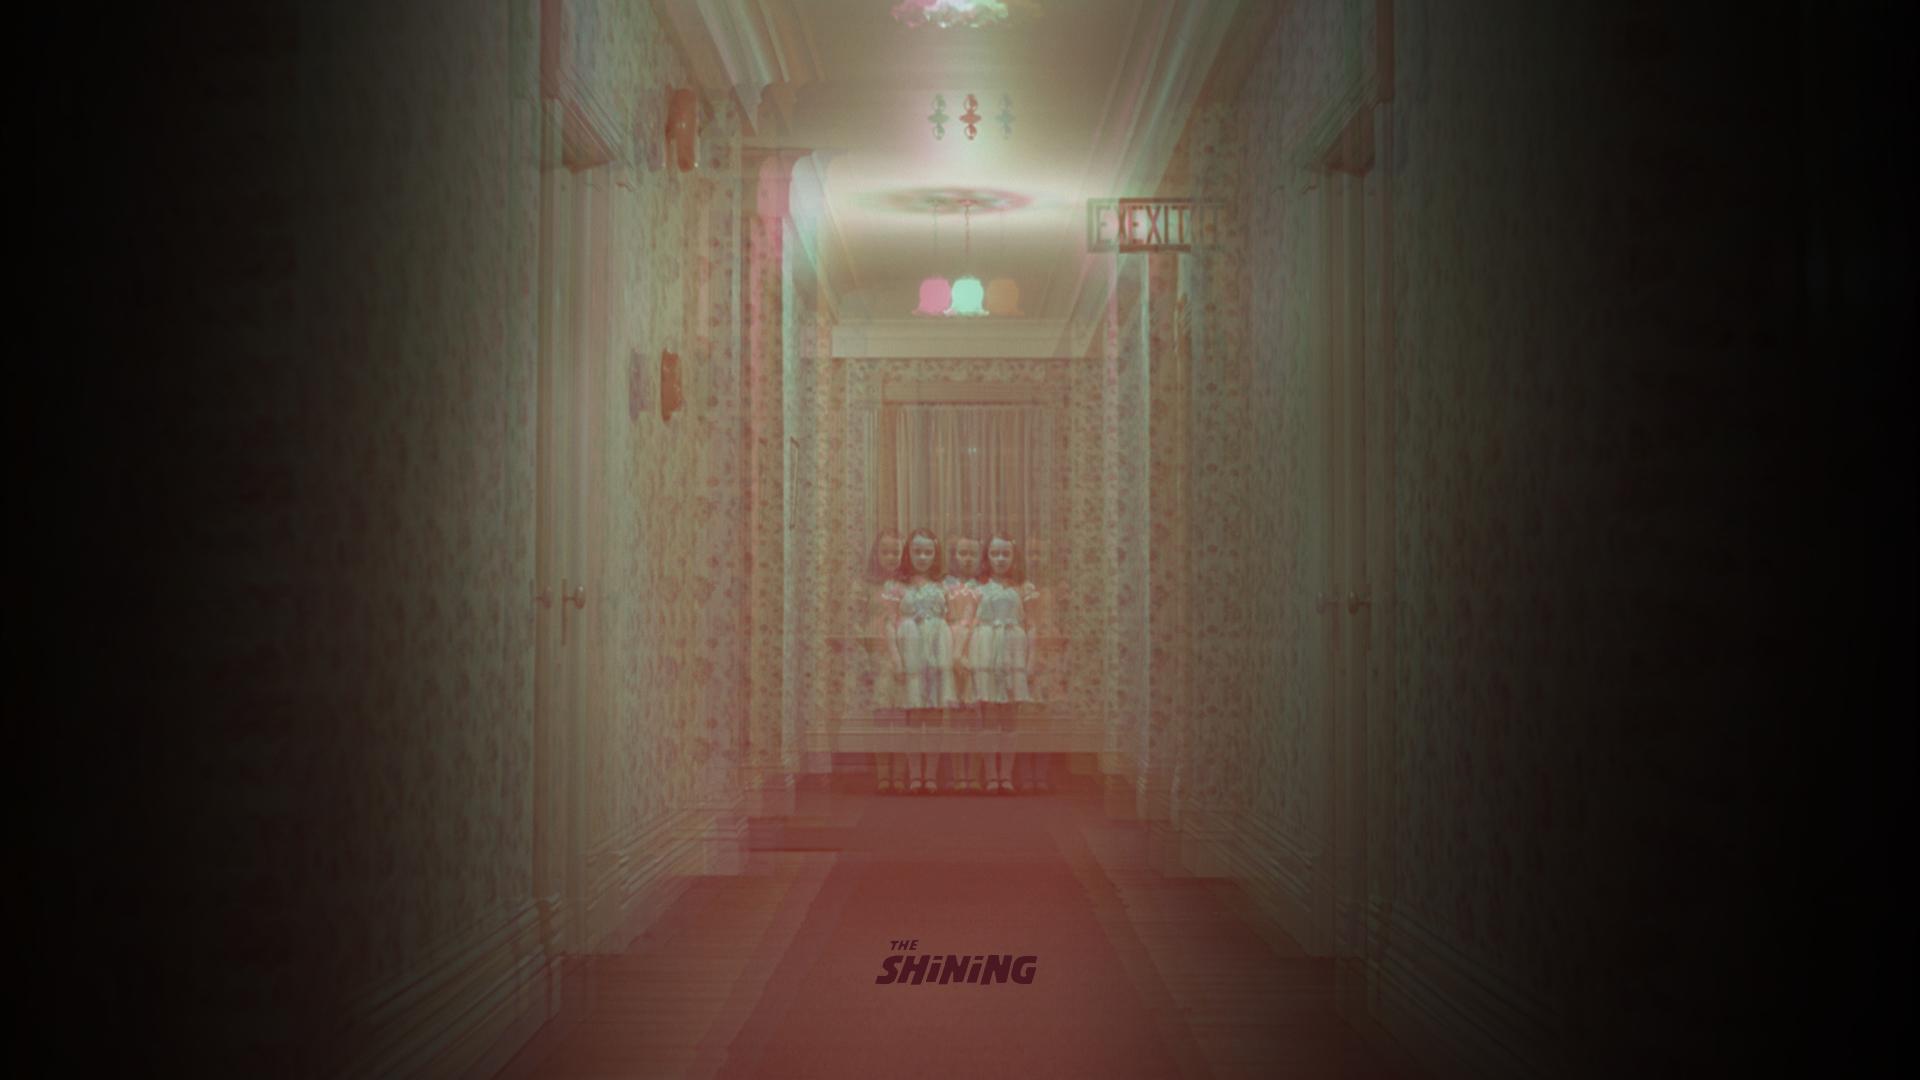 Shining wallpaper - 865138